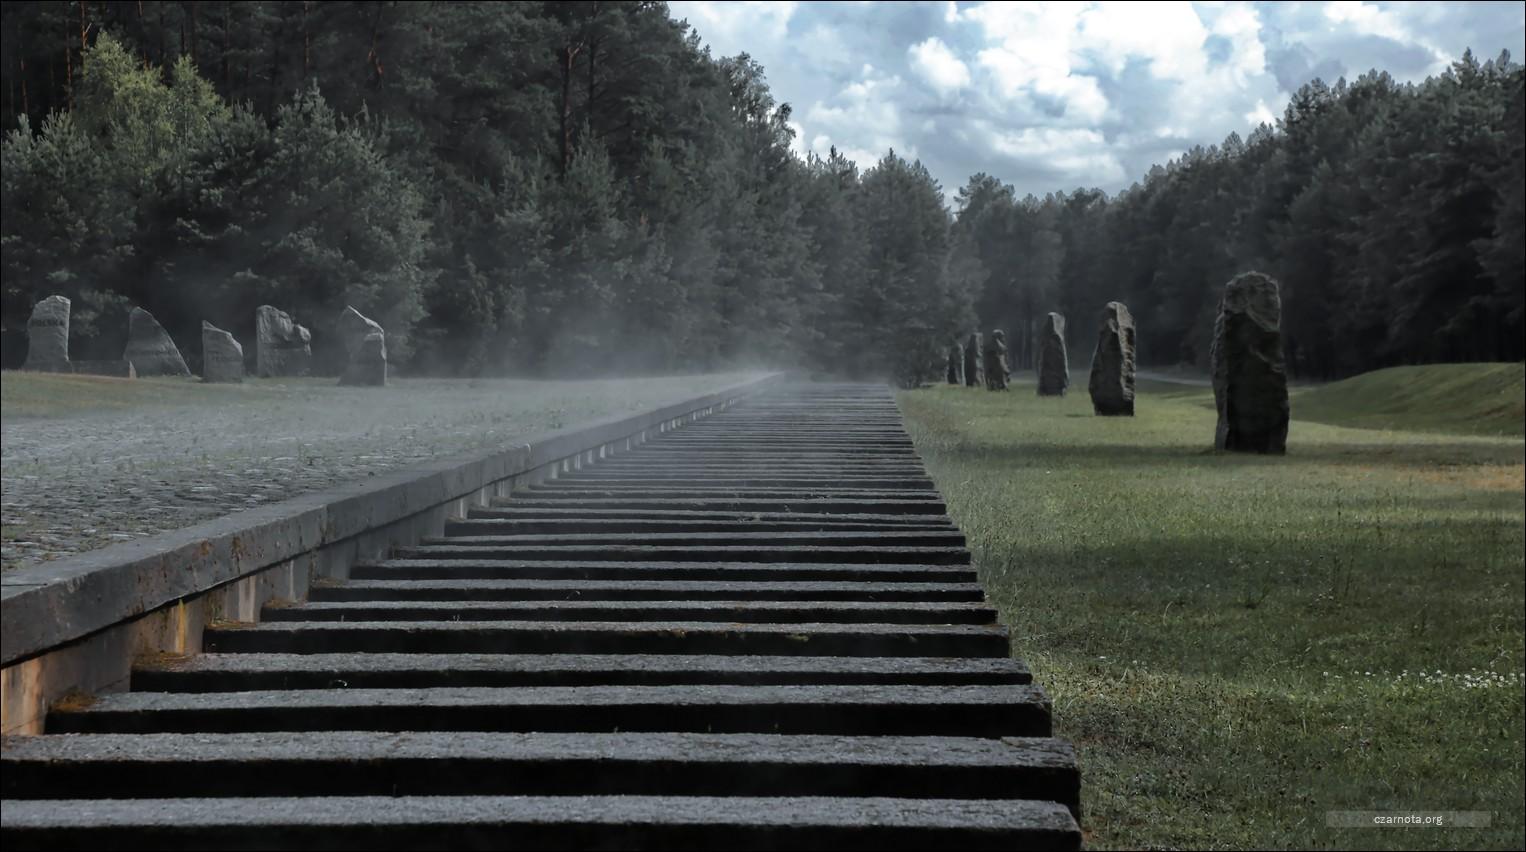 Poland, Treblinka II death camp, The Hell of the World